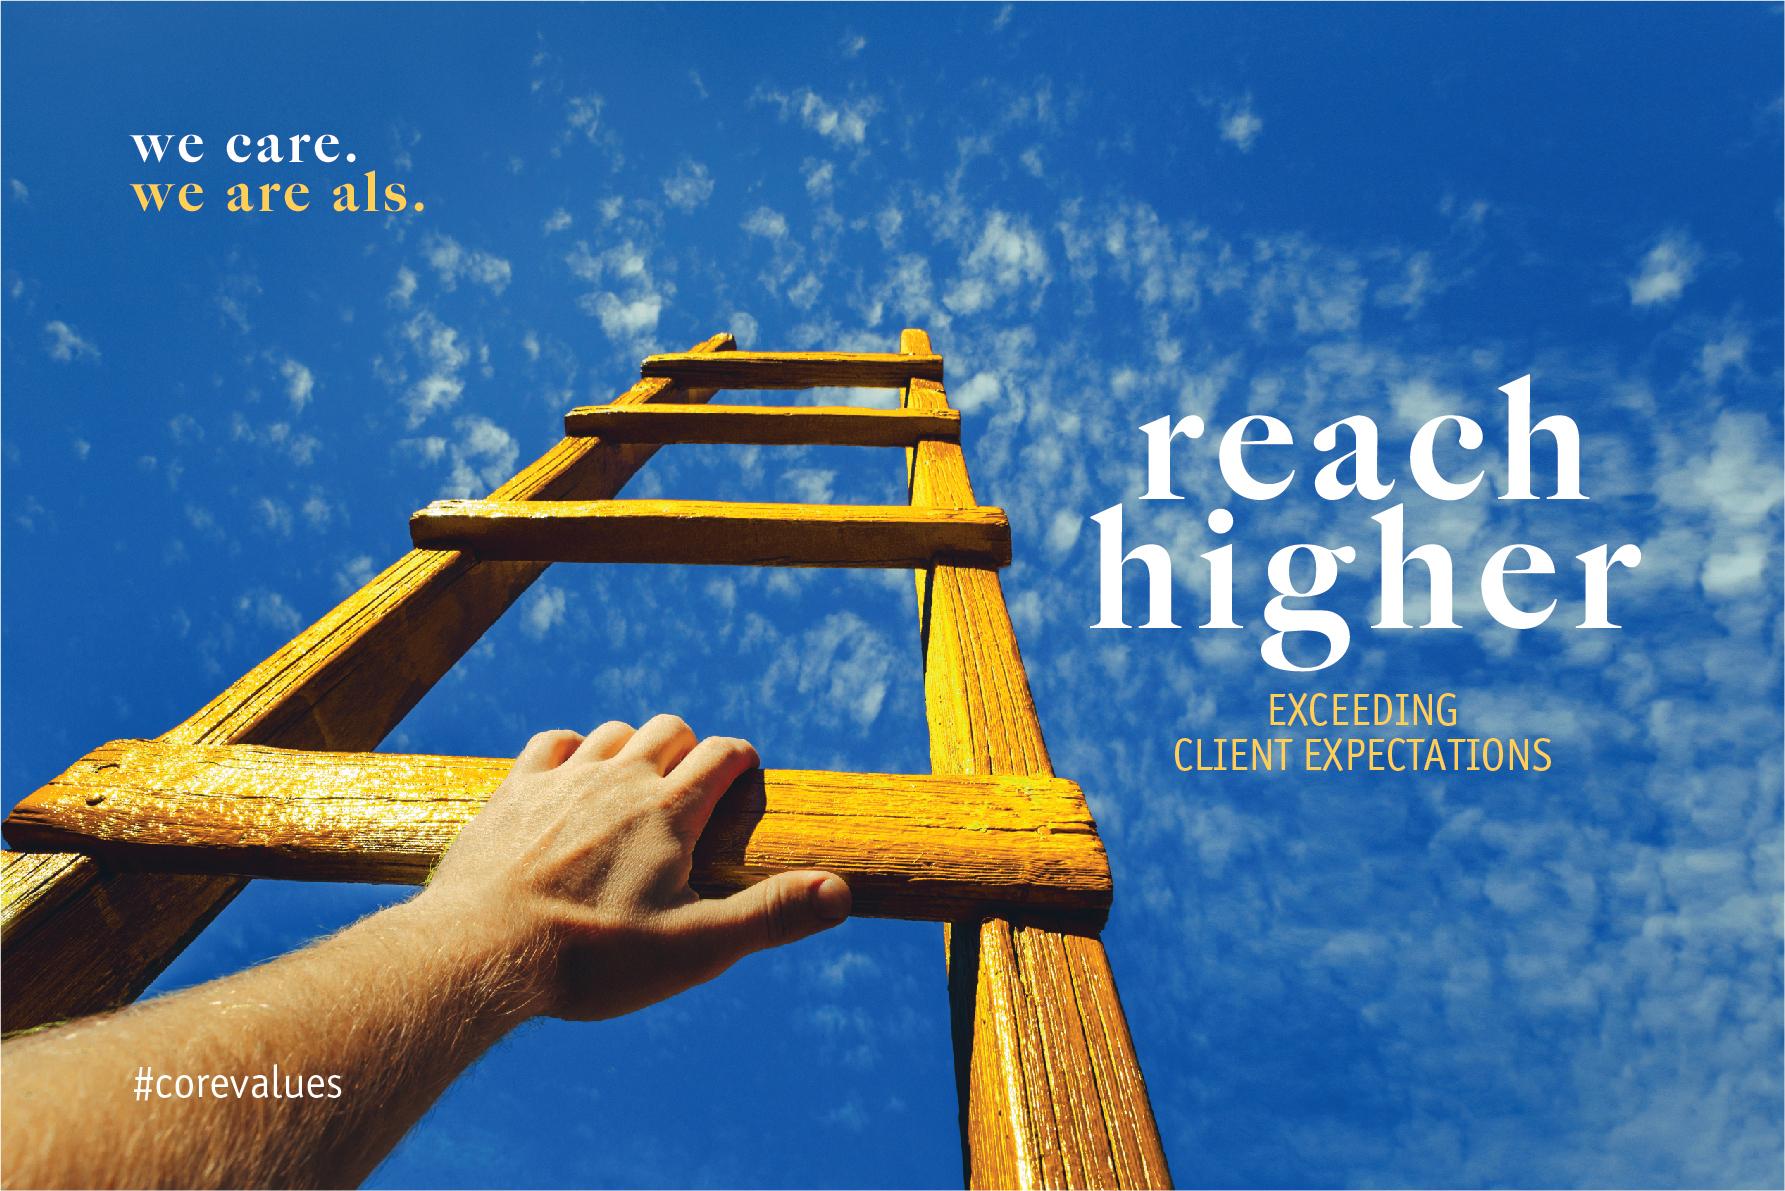 ALS core values Reach higher